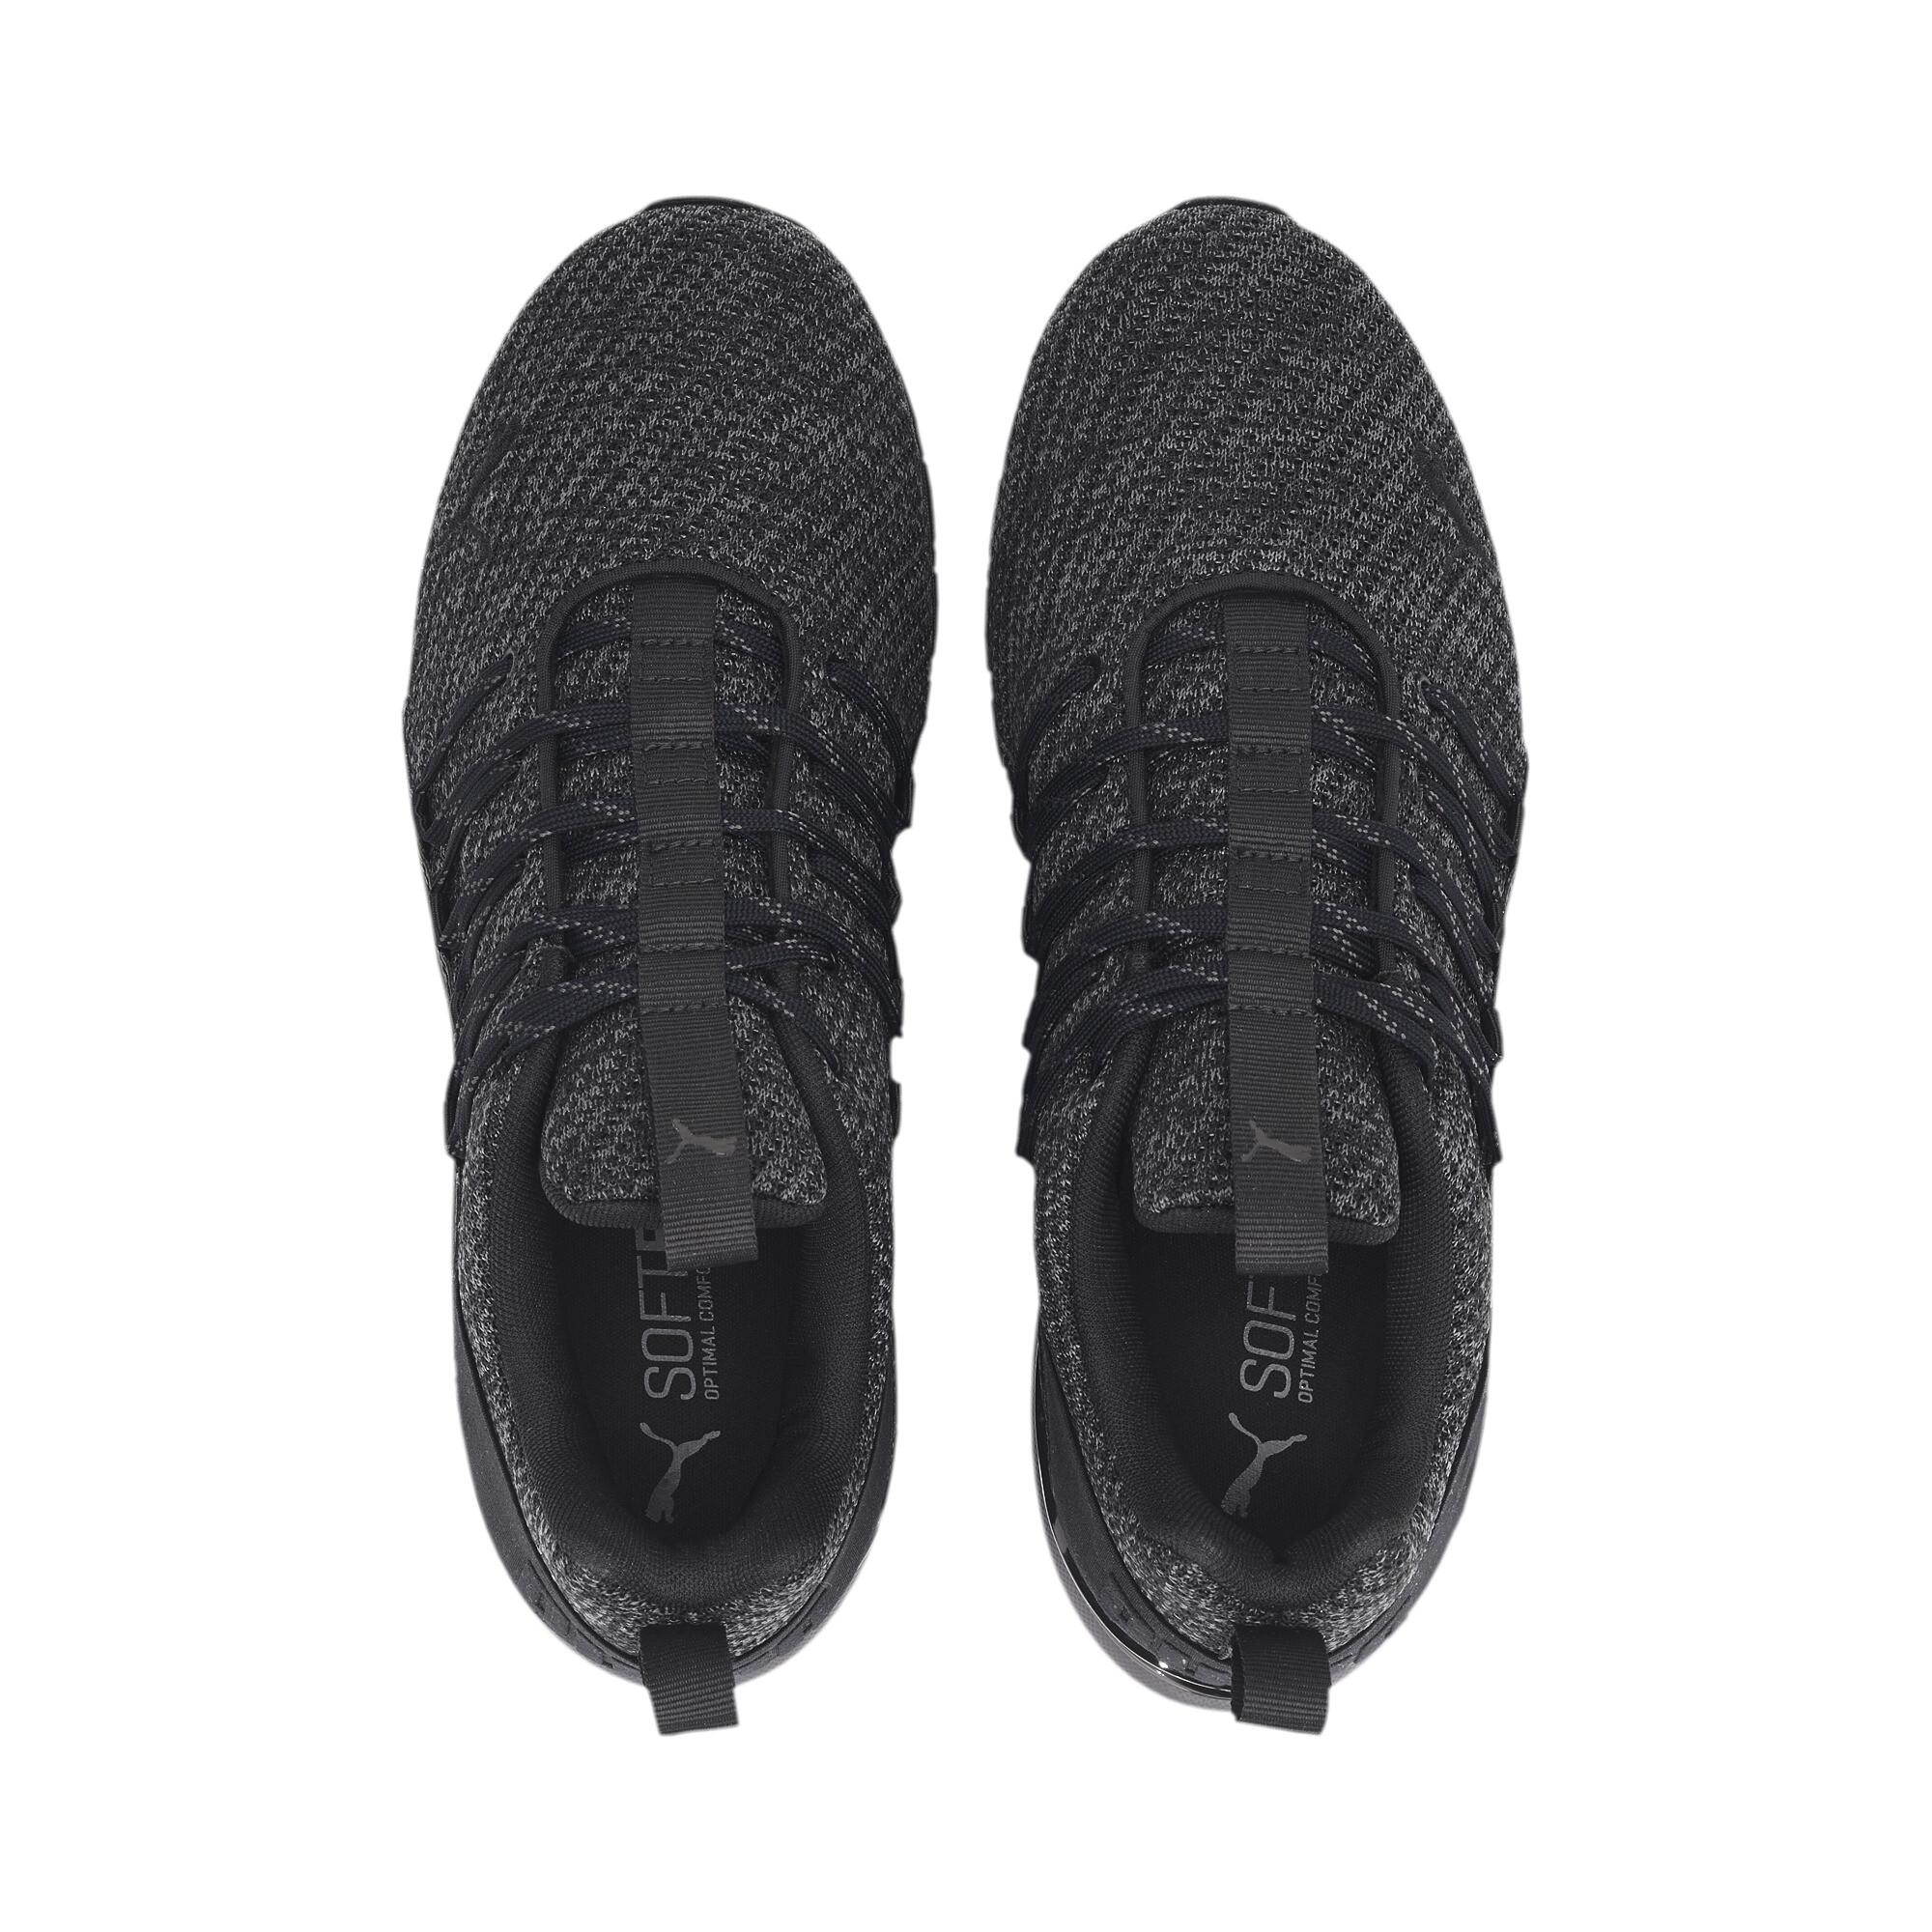 PUMA-Men-039-s-Axelion-Ultra-Running-Shoes thumbnail 27